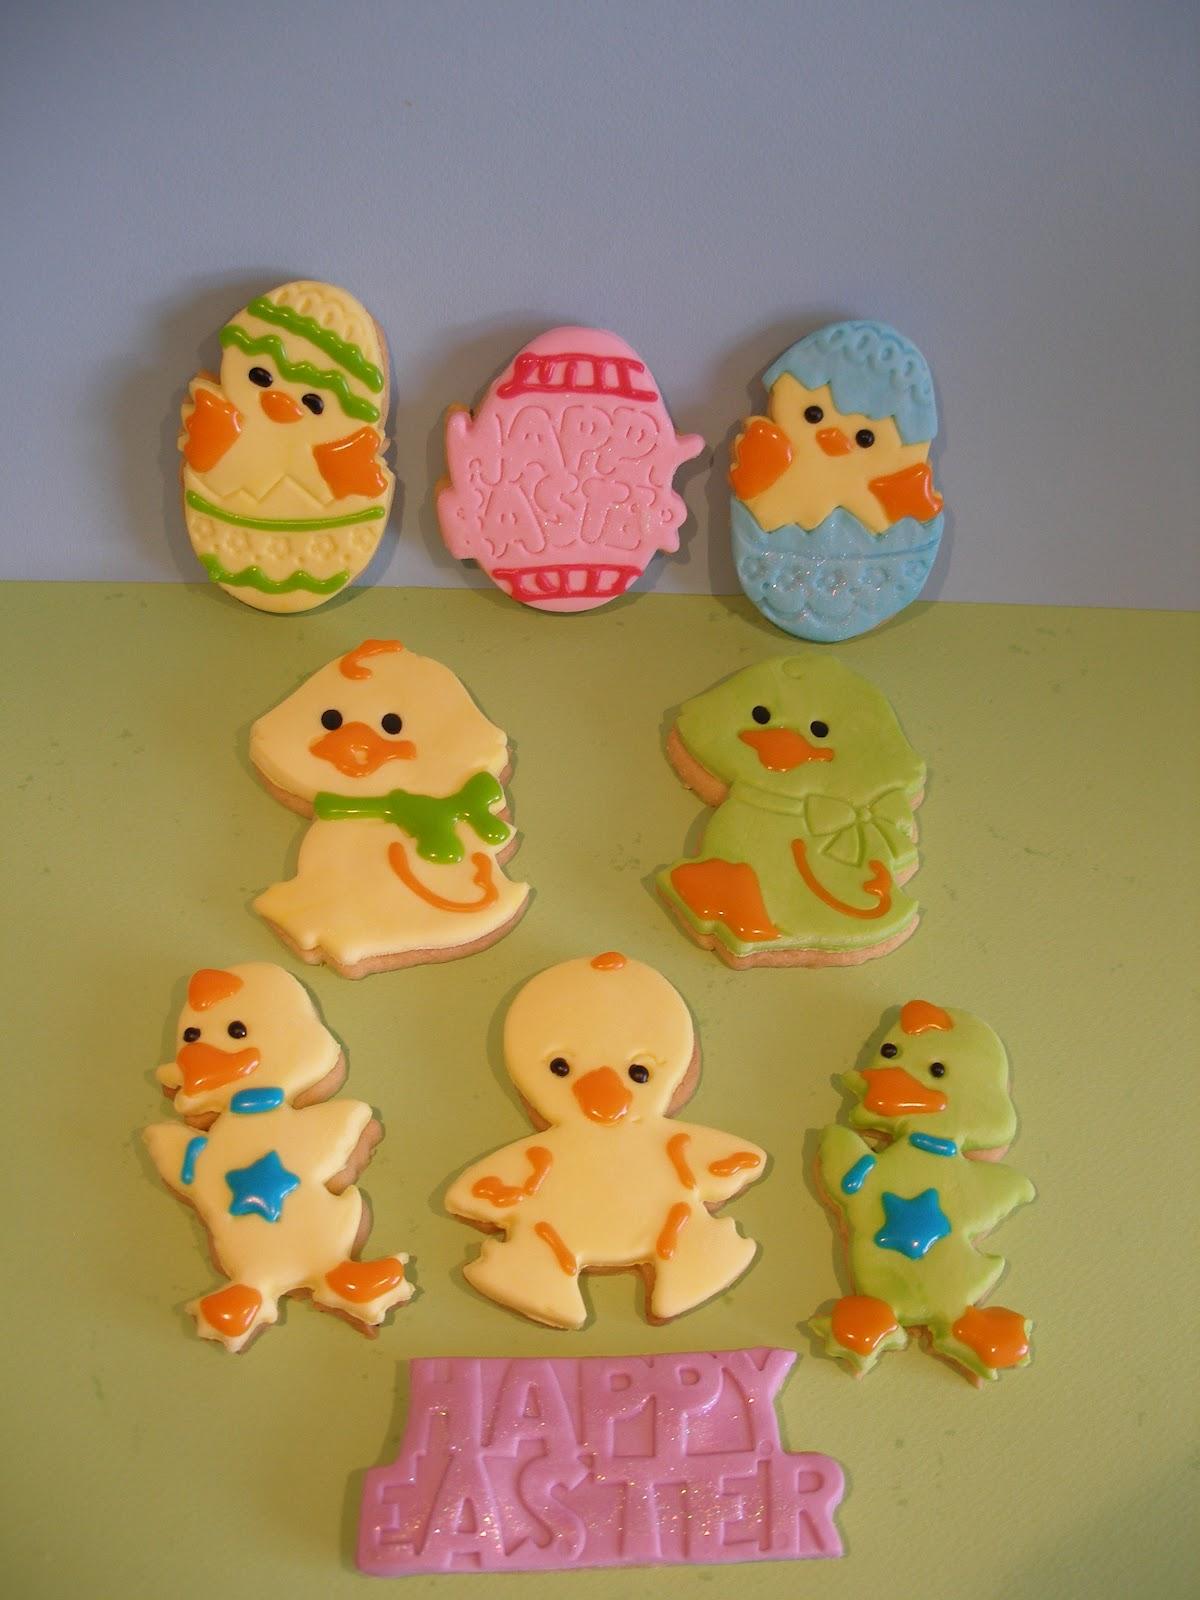 Sweet cookies 4 you